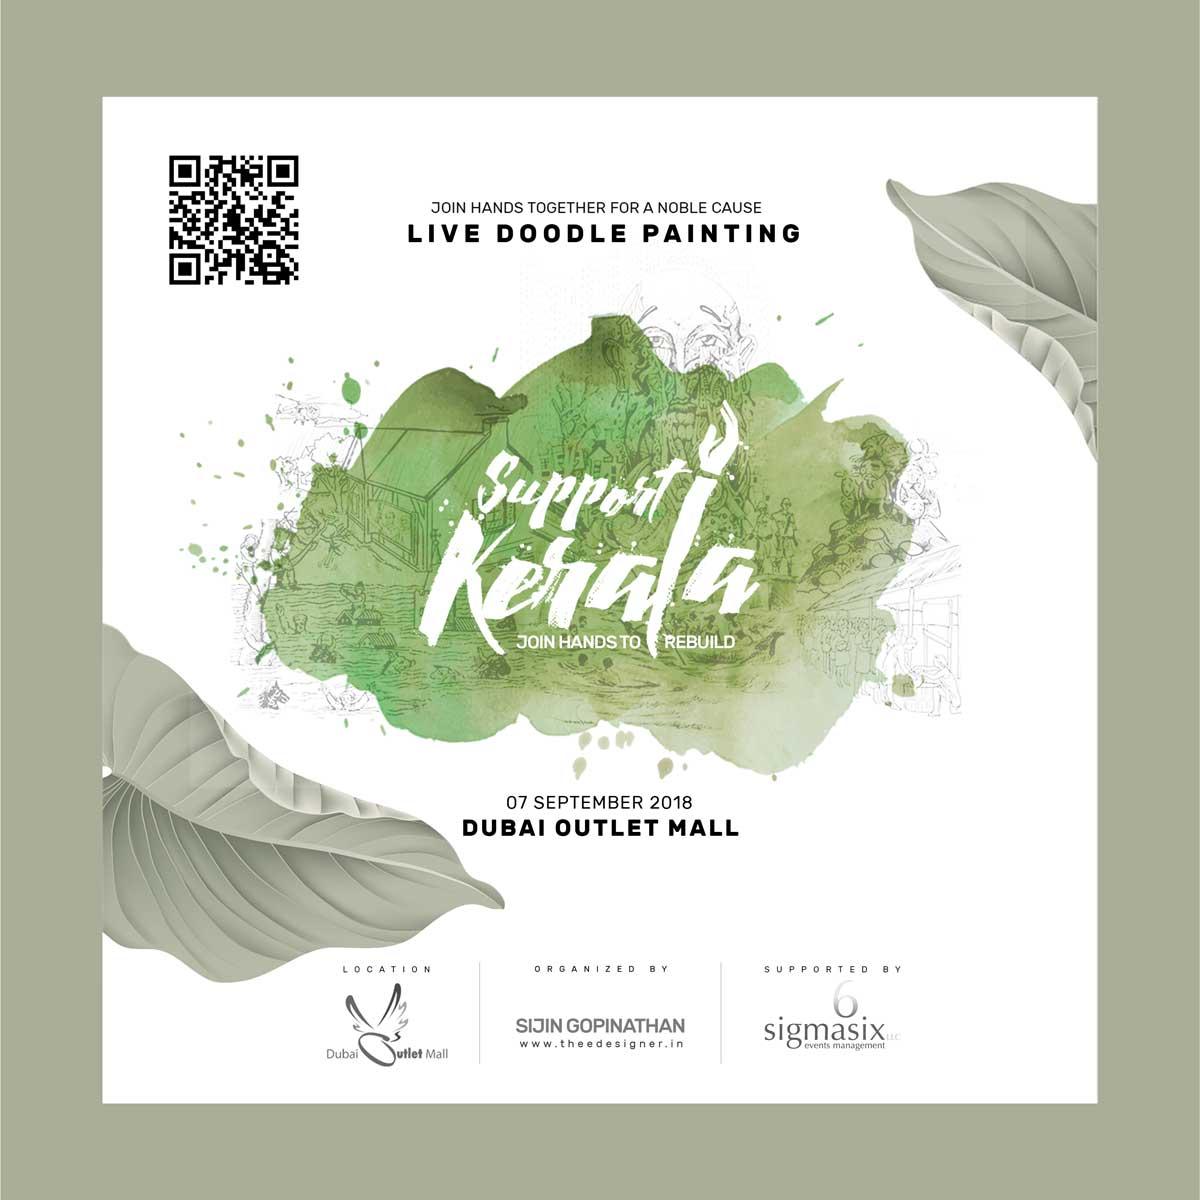 Support Kerala - Poster Design